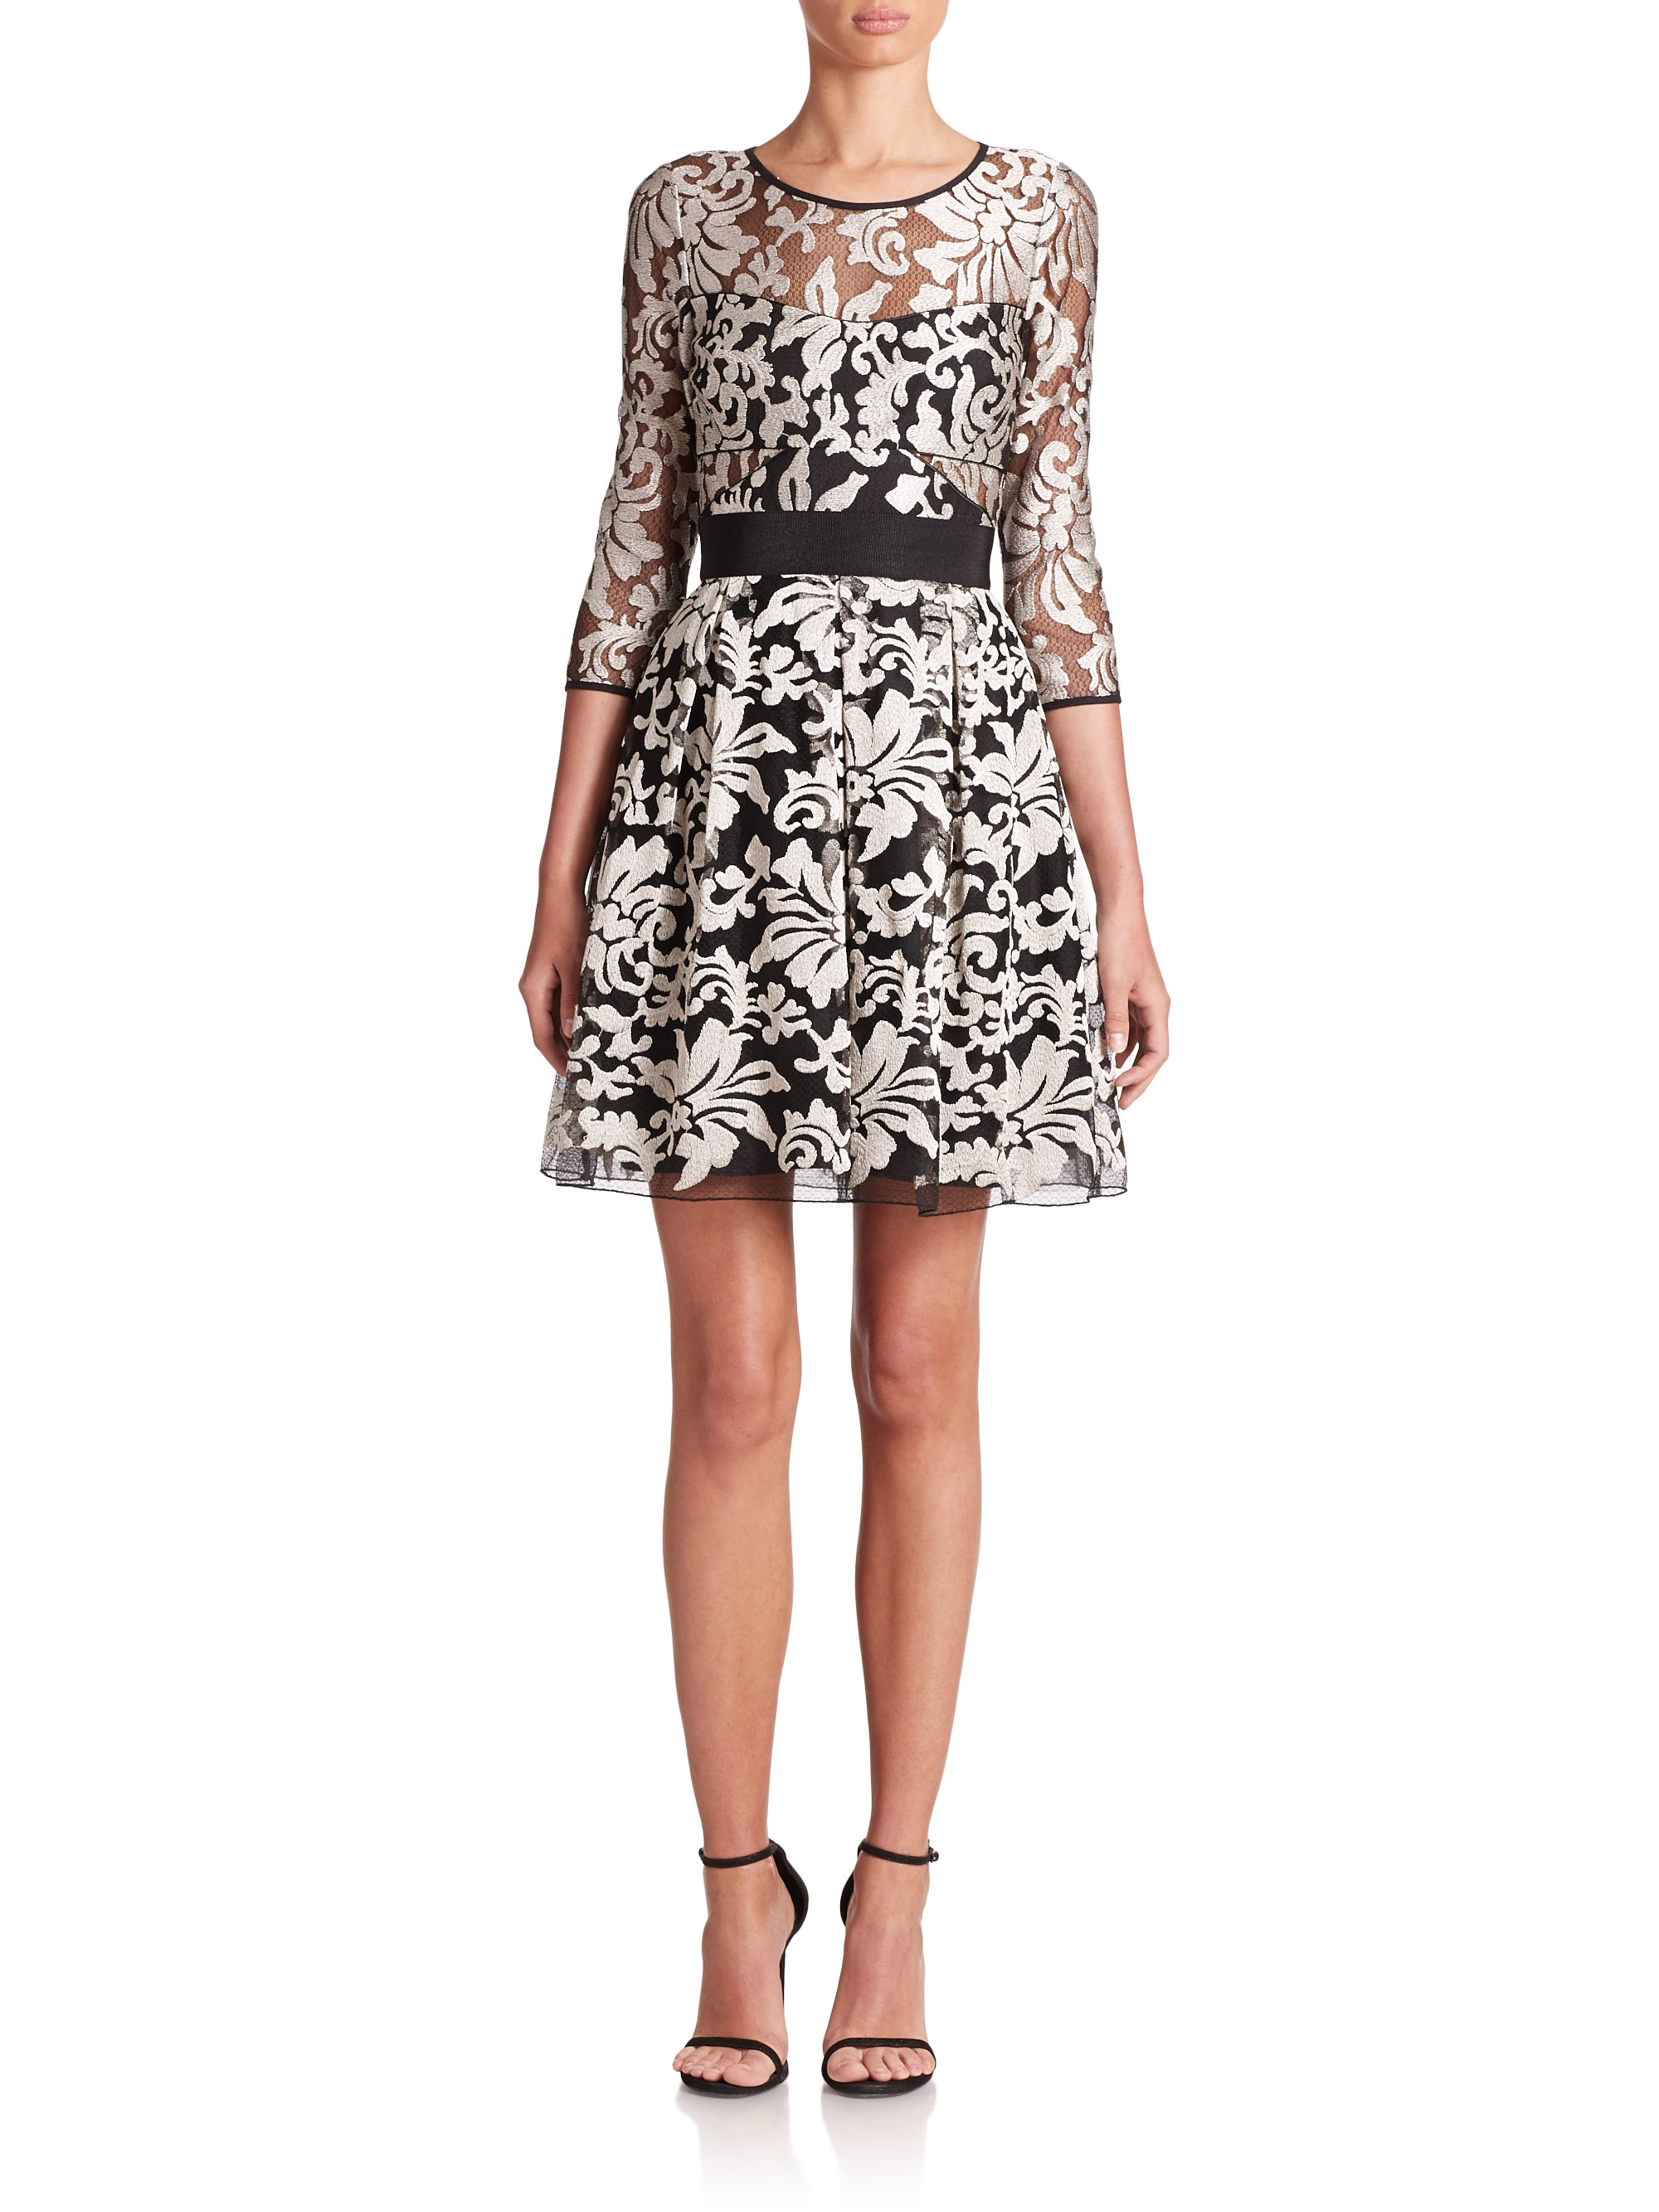 Lyst Abs By Allen Schwartz Lace Fit Amp Flare Dress In